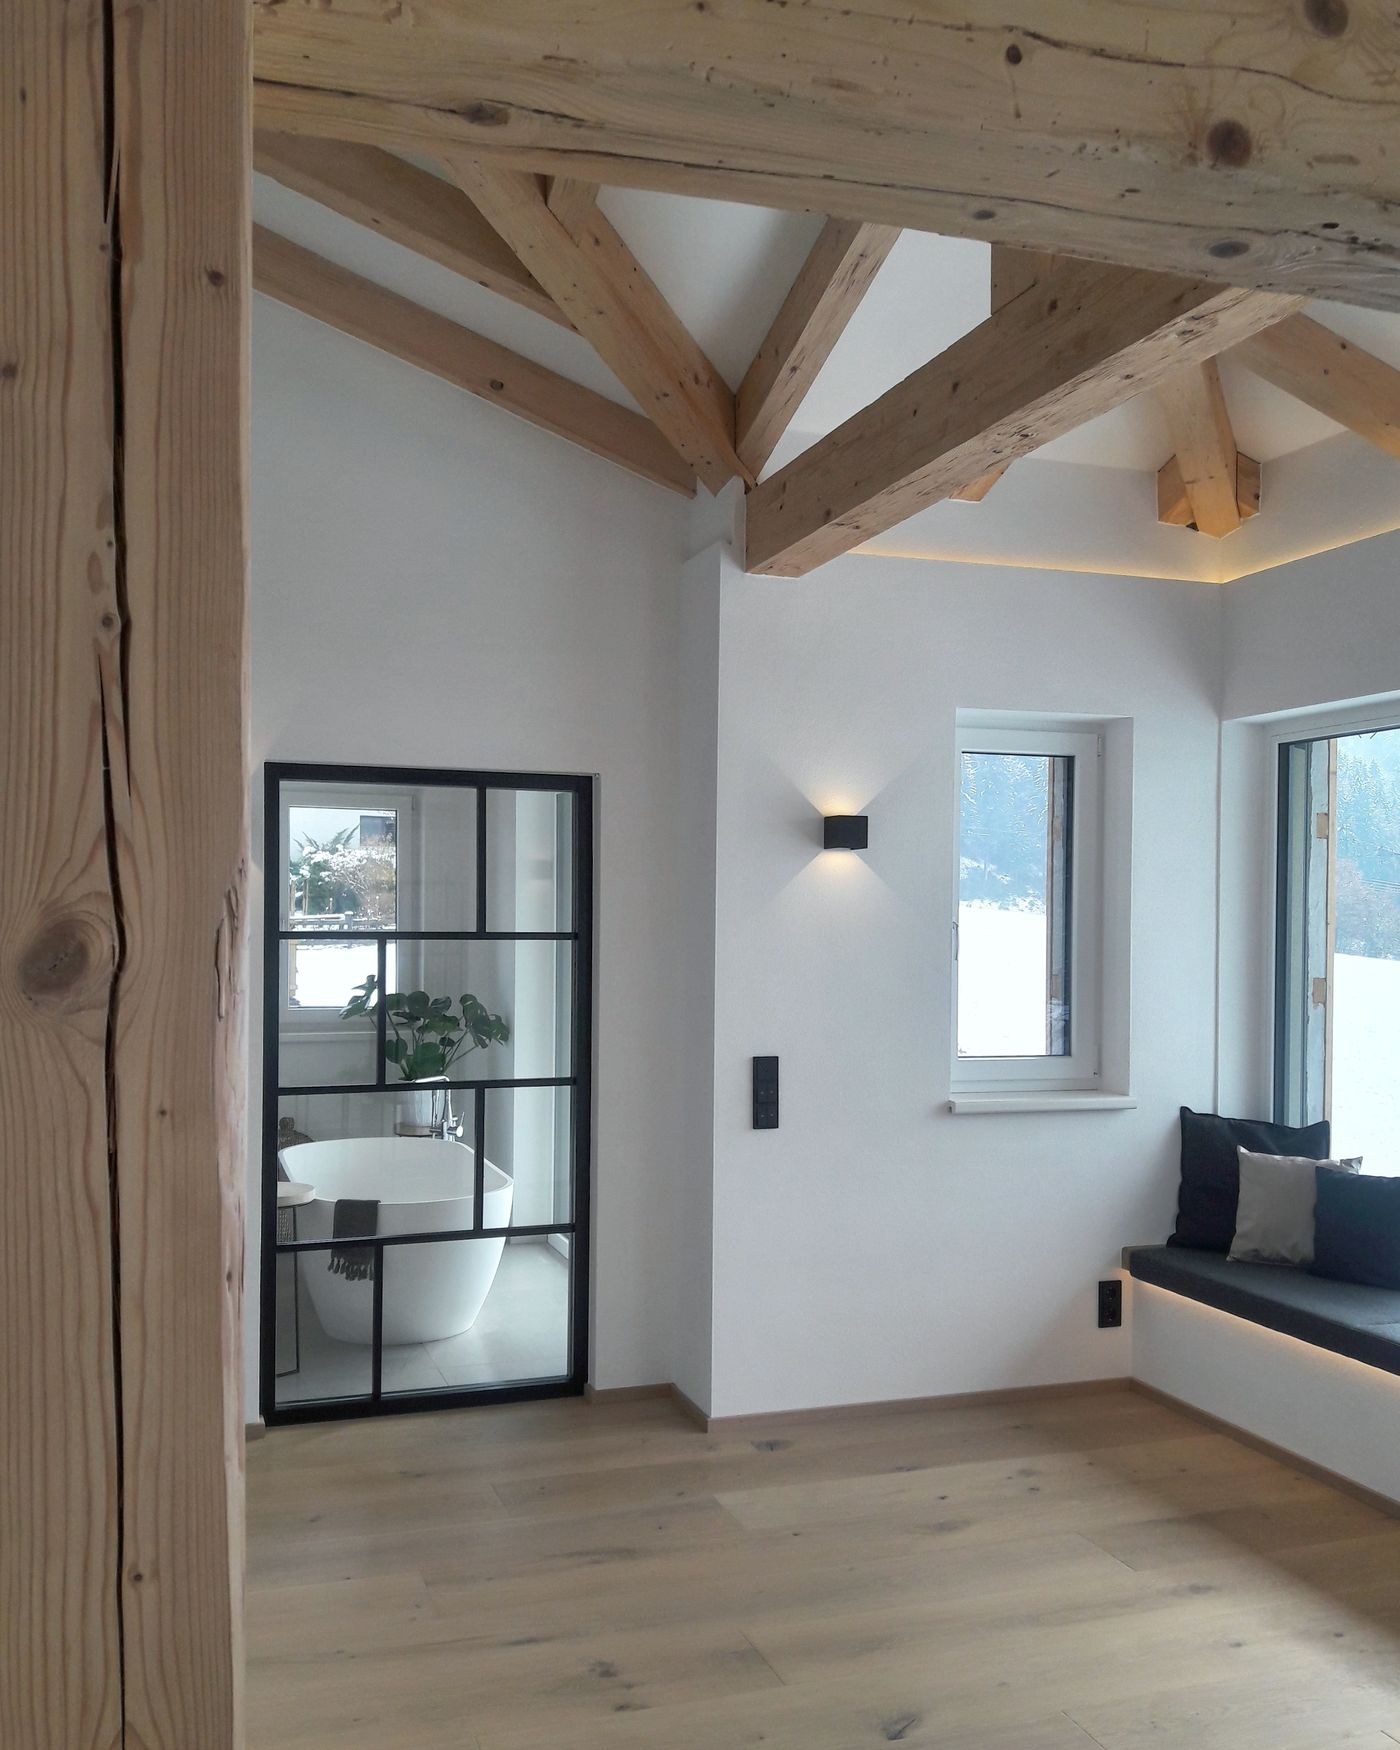 wunderbar k che dachgeschoss ideen bilder die besten wohnideen. Black Bedroom Furniture Sets. Home Design Ideas